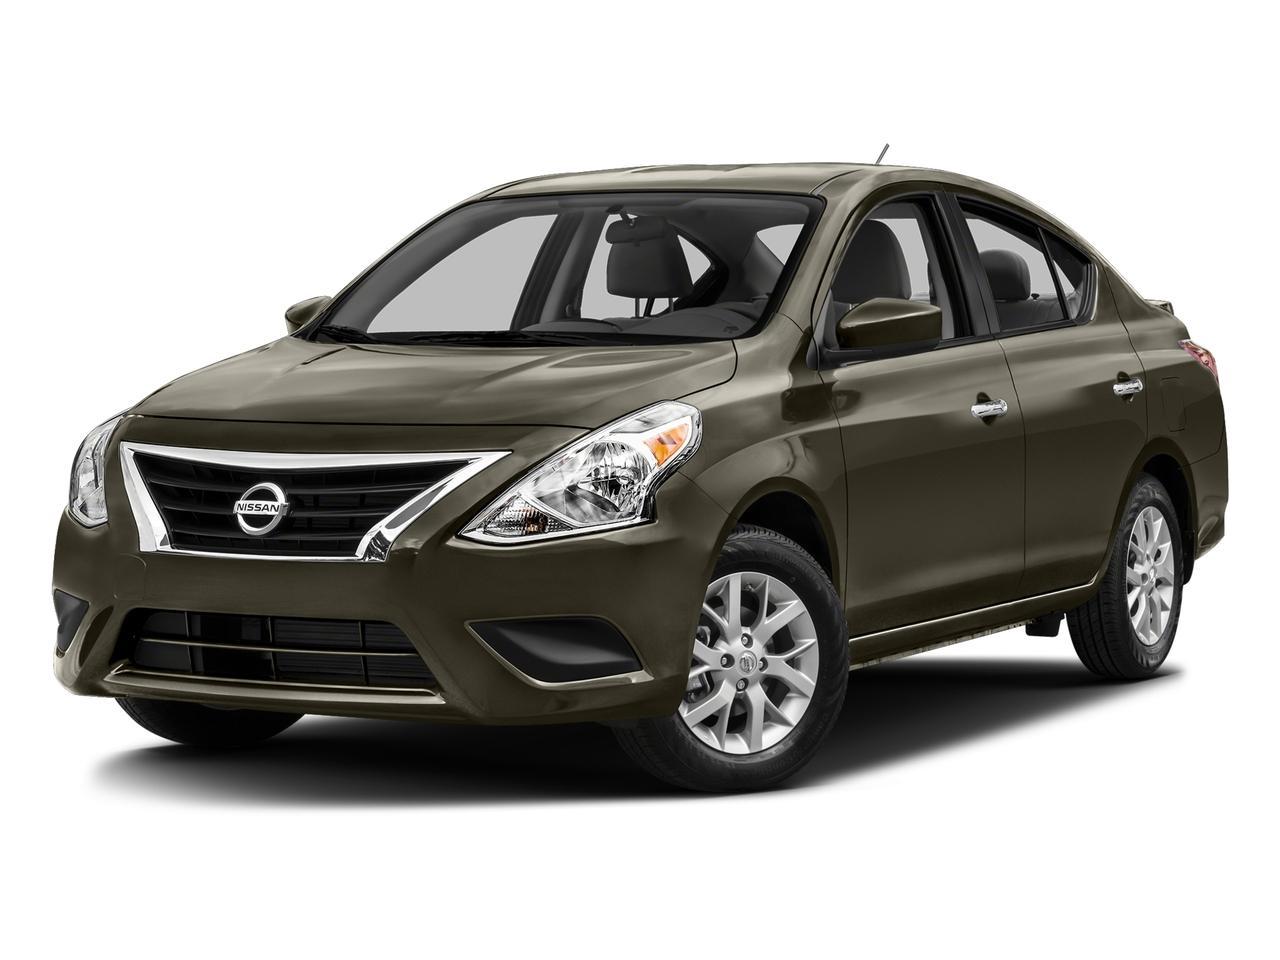 2017 Nissan Versa Sedan Vehicle Photo in Helena, MT 59601